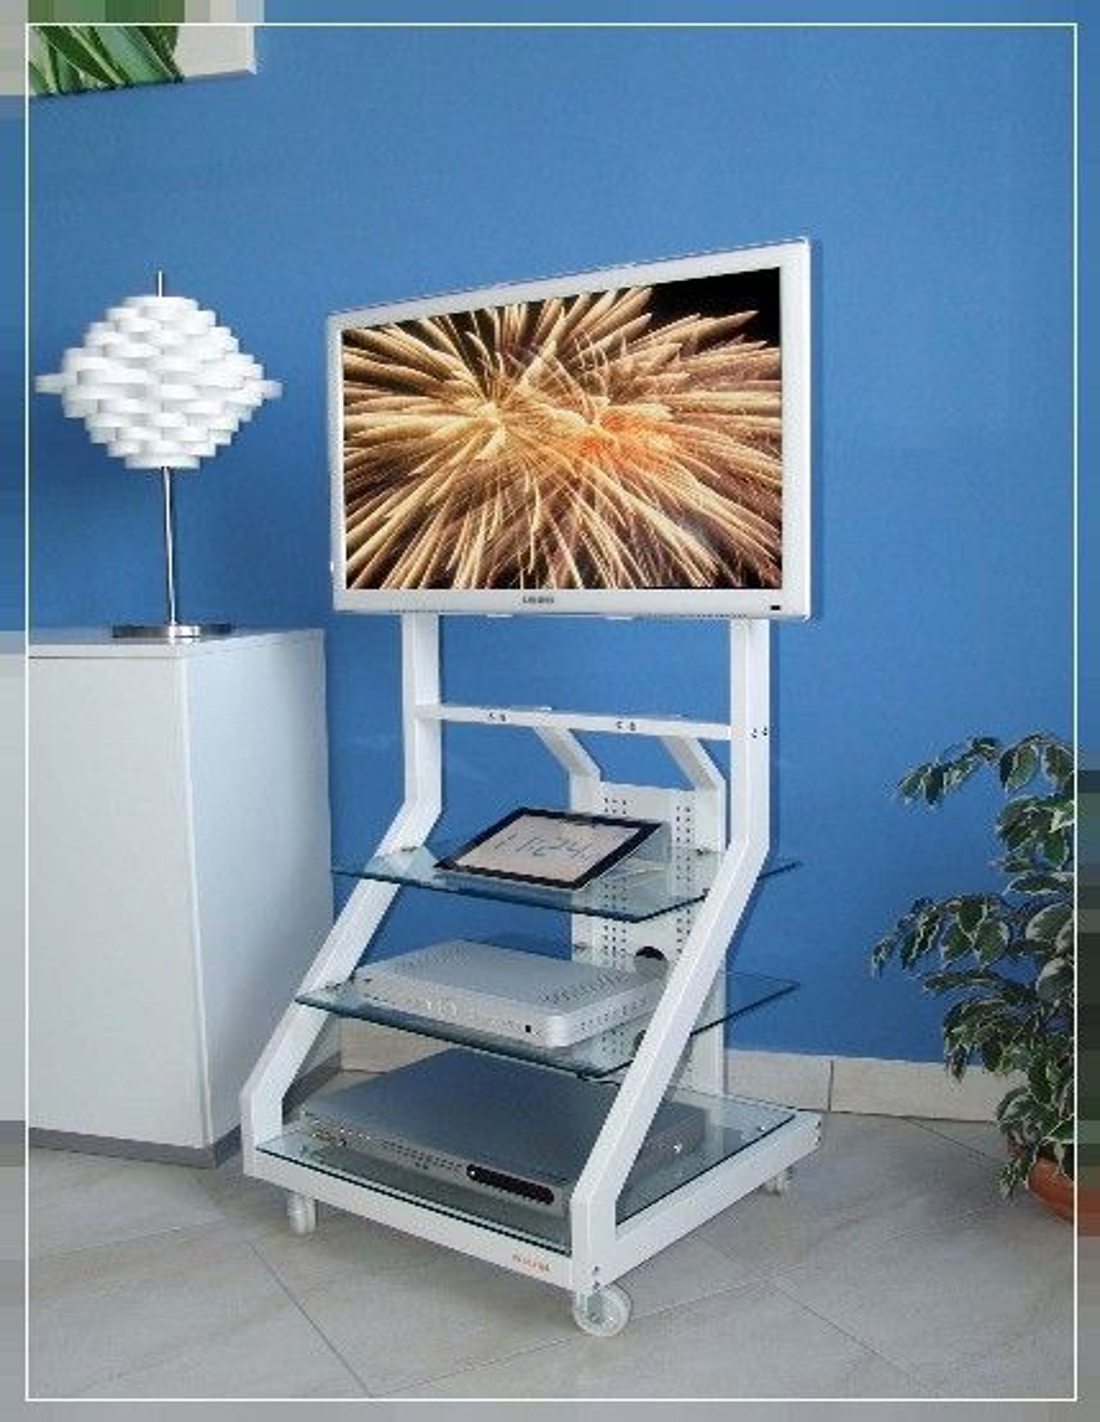 Mobili porta tv design images - Mobili porta tv design ...